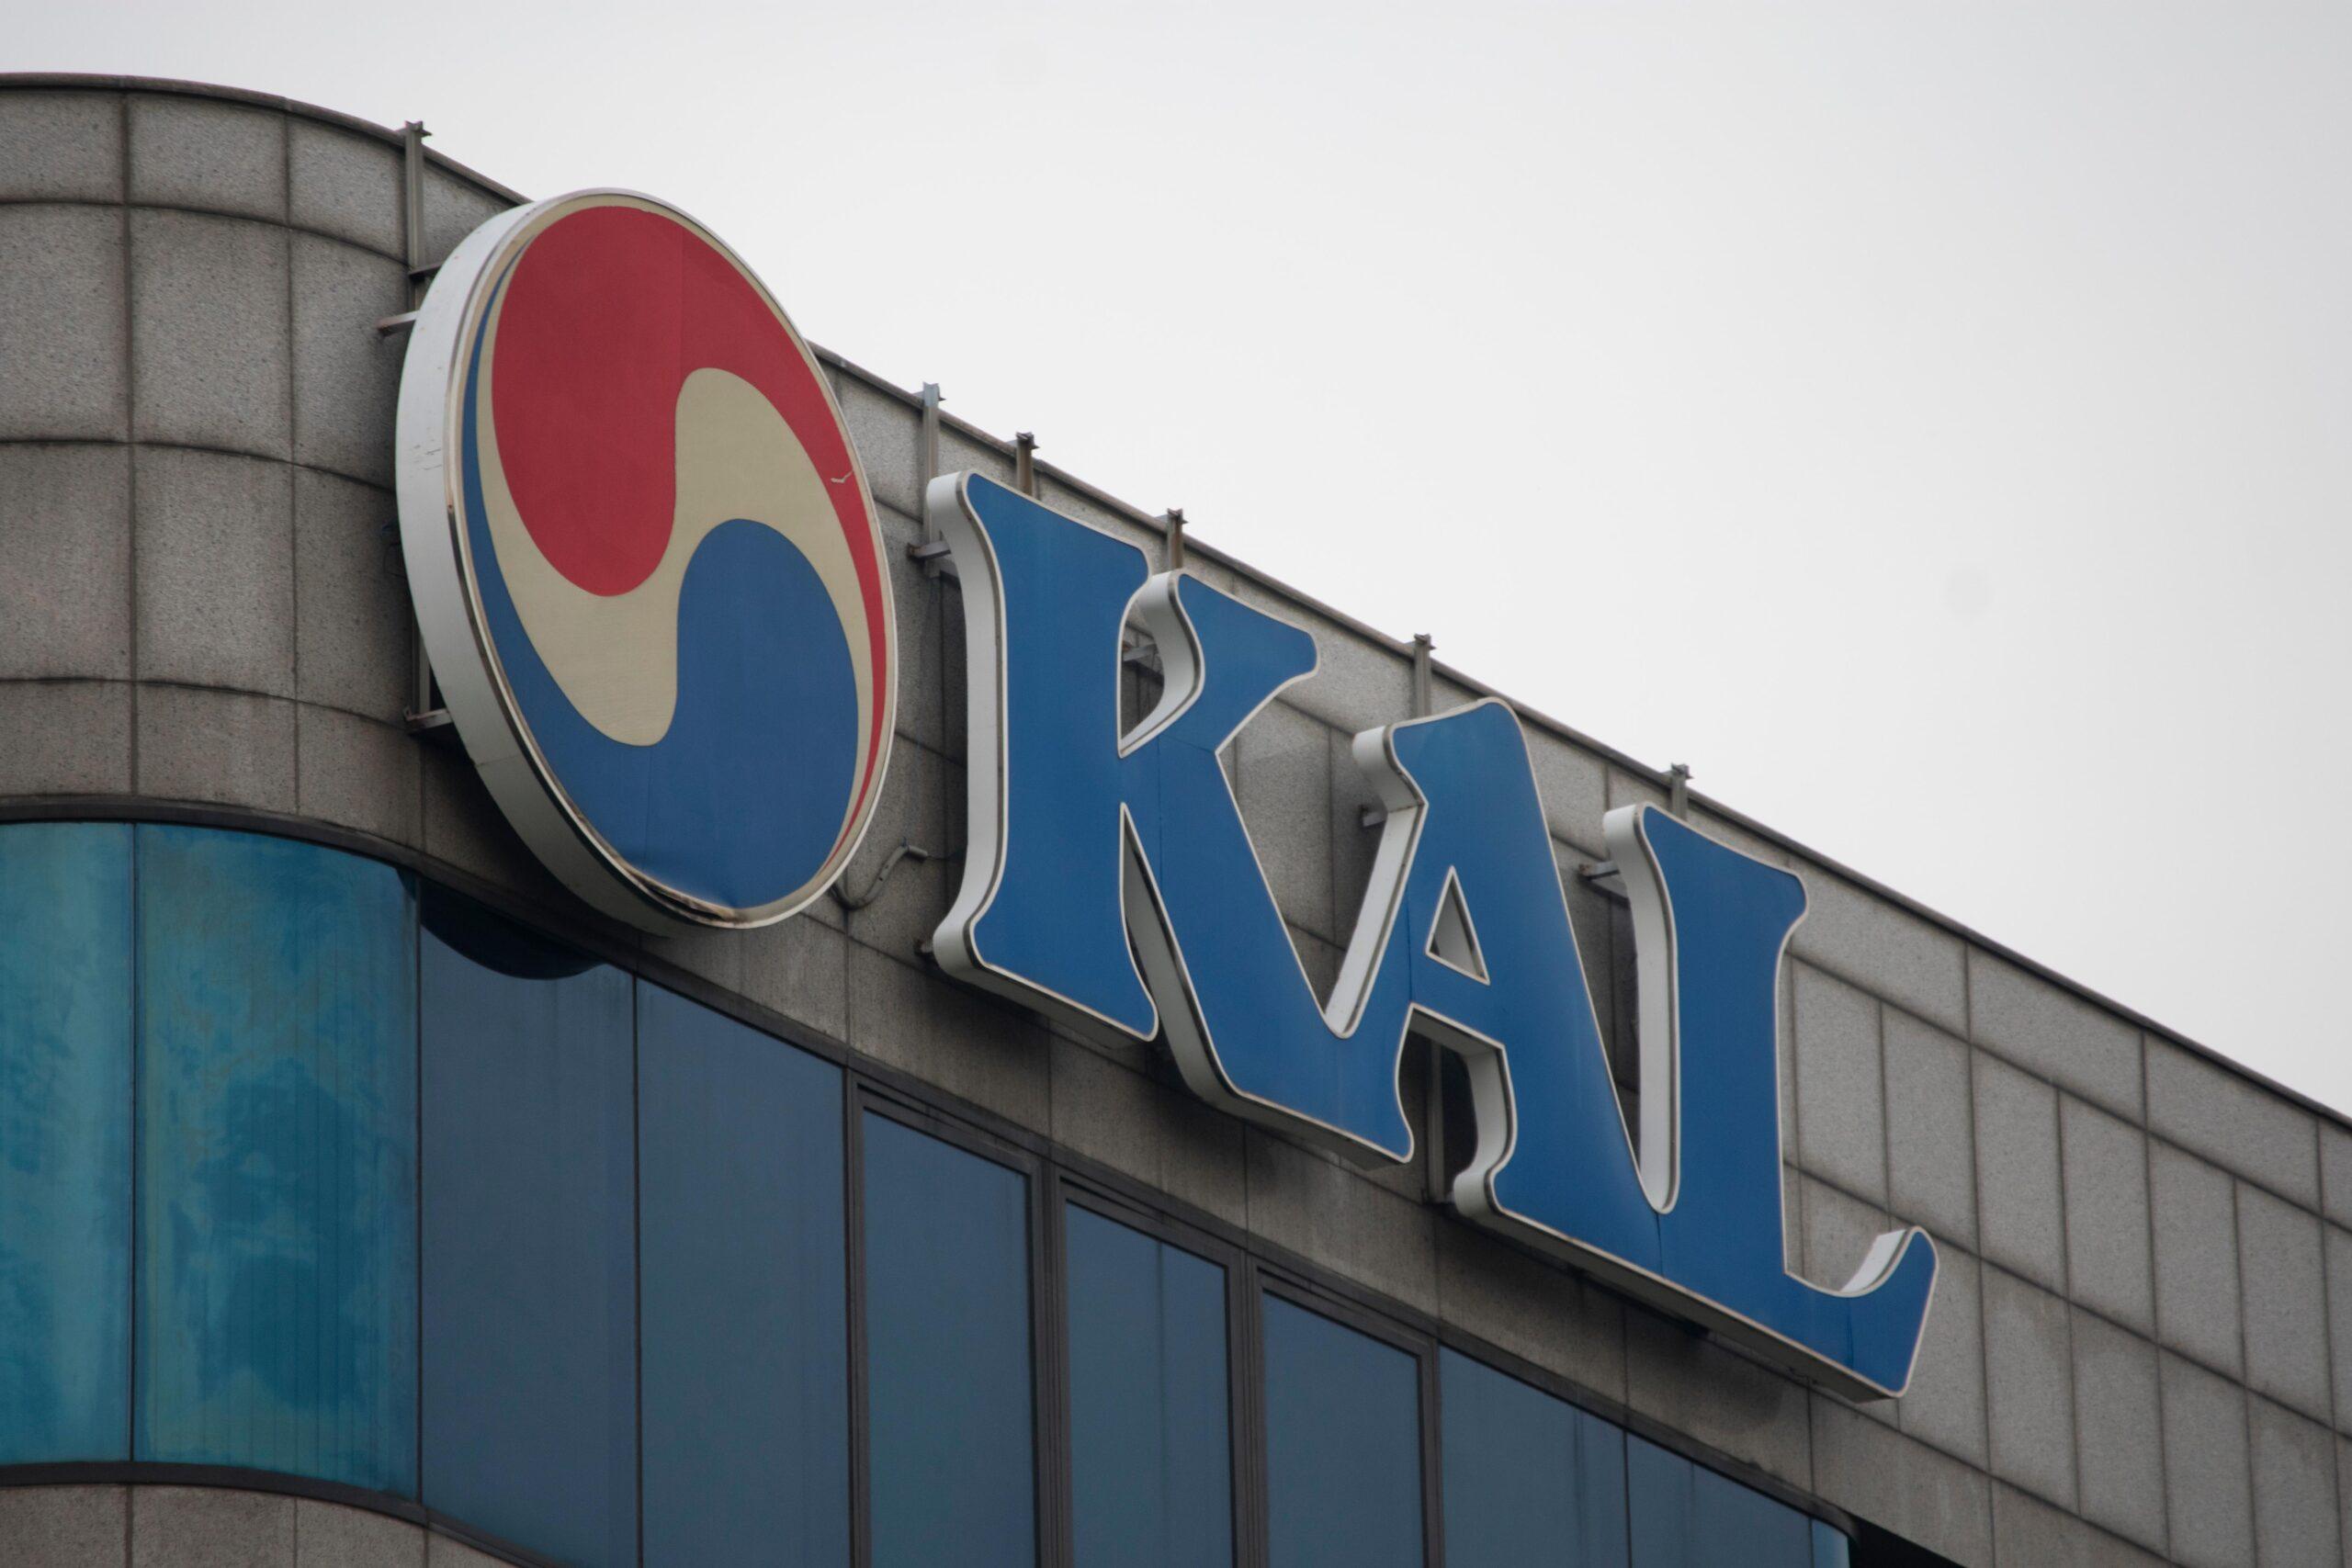 Korean Air announces $ 219 profit result for 2020 1